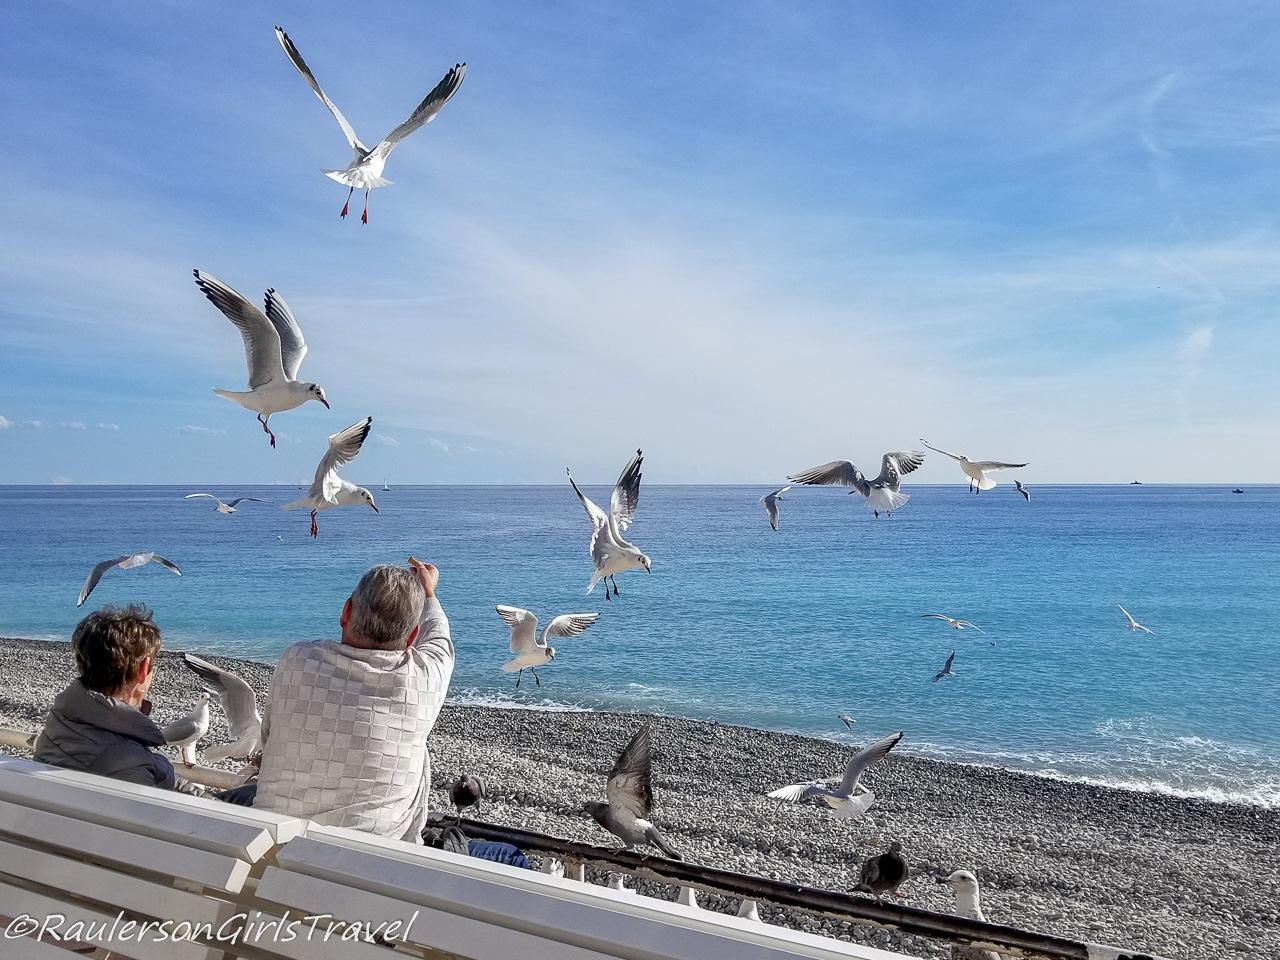 Couple feeding seagulls in Nice, France